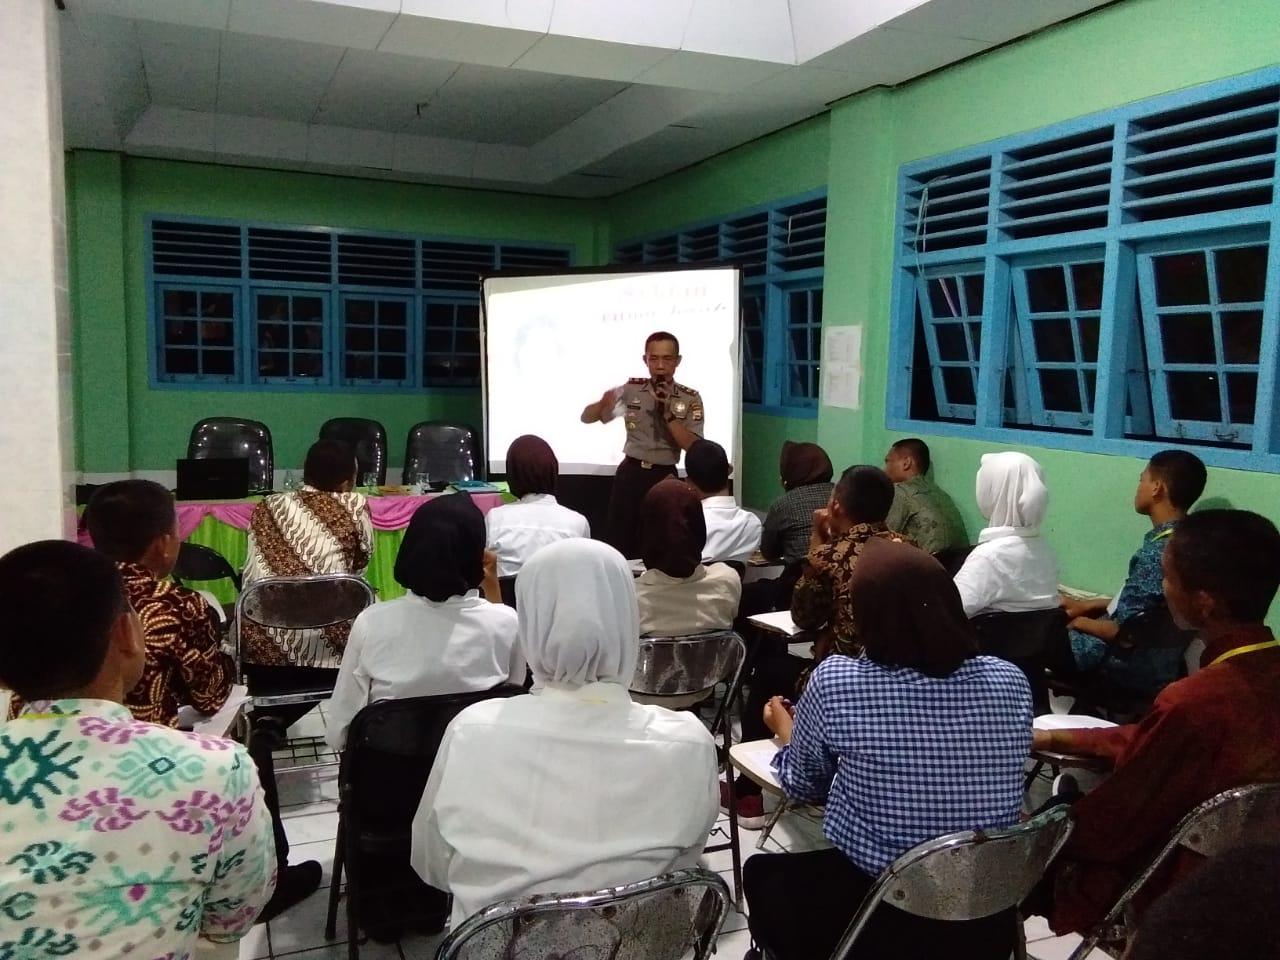 Cegah Penyalahgunaan Narkoba, Sat Binmas Polres Bengkulu Selatan Binluh Peserta Paskibraka